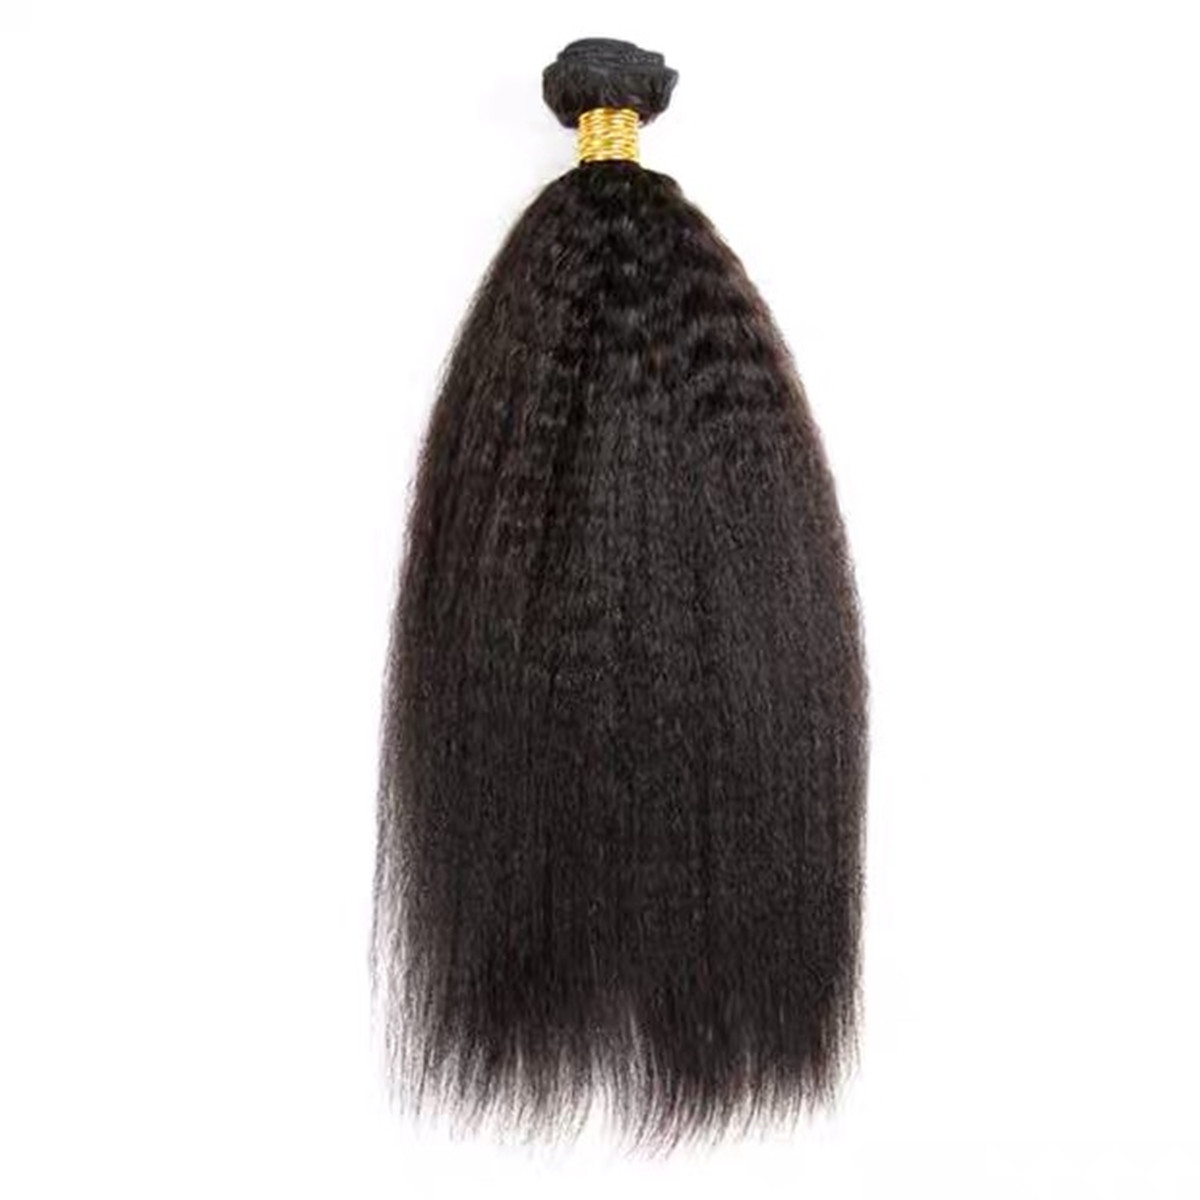 LEDON Hair Weft, Kinky Straight KKS, 1B Natural Black,100% Human Remy Hair Extensions